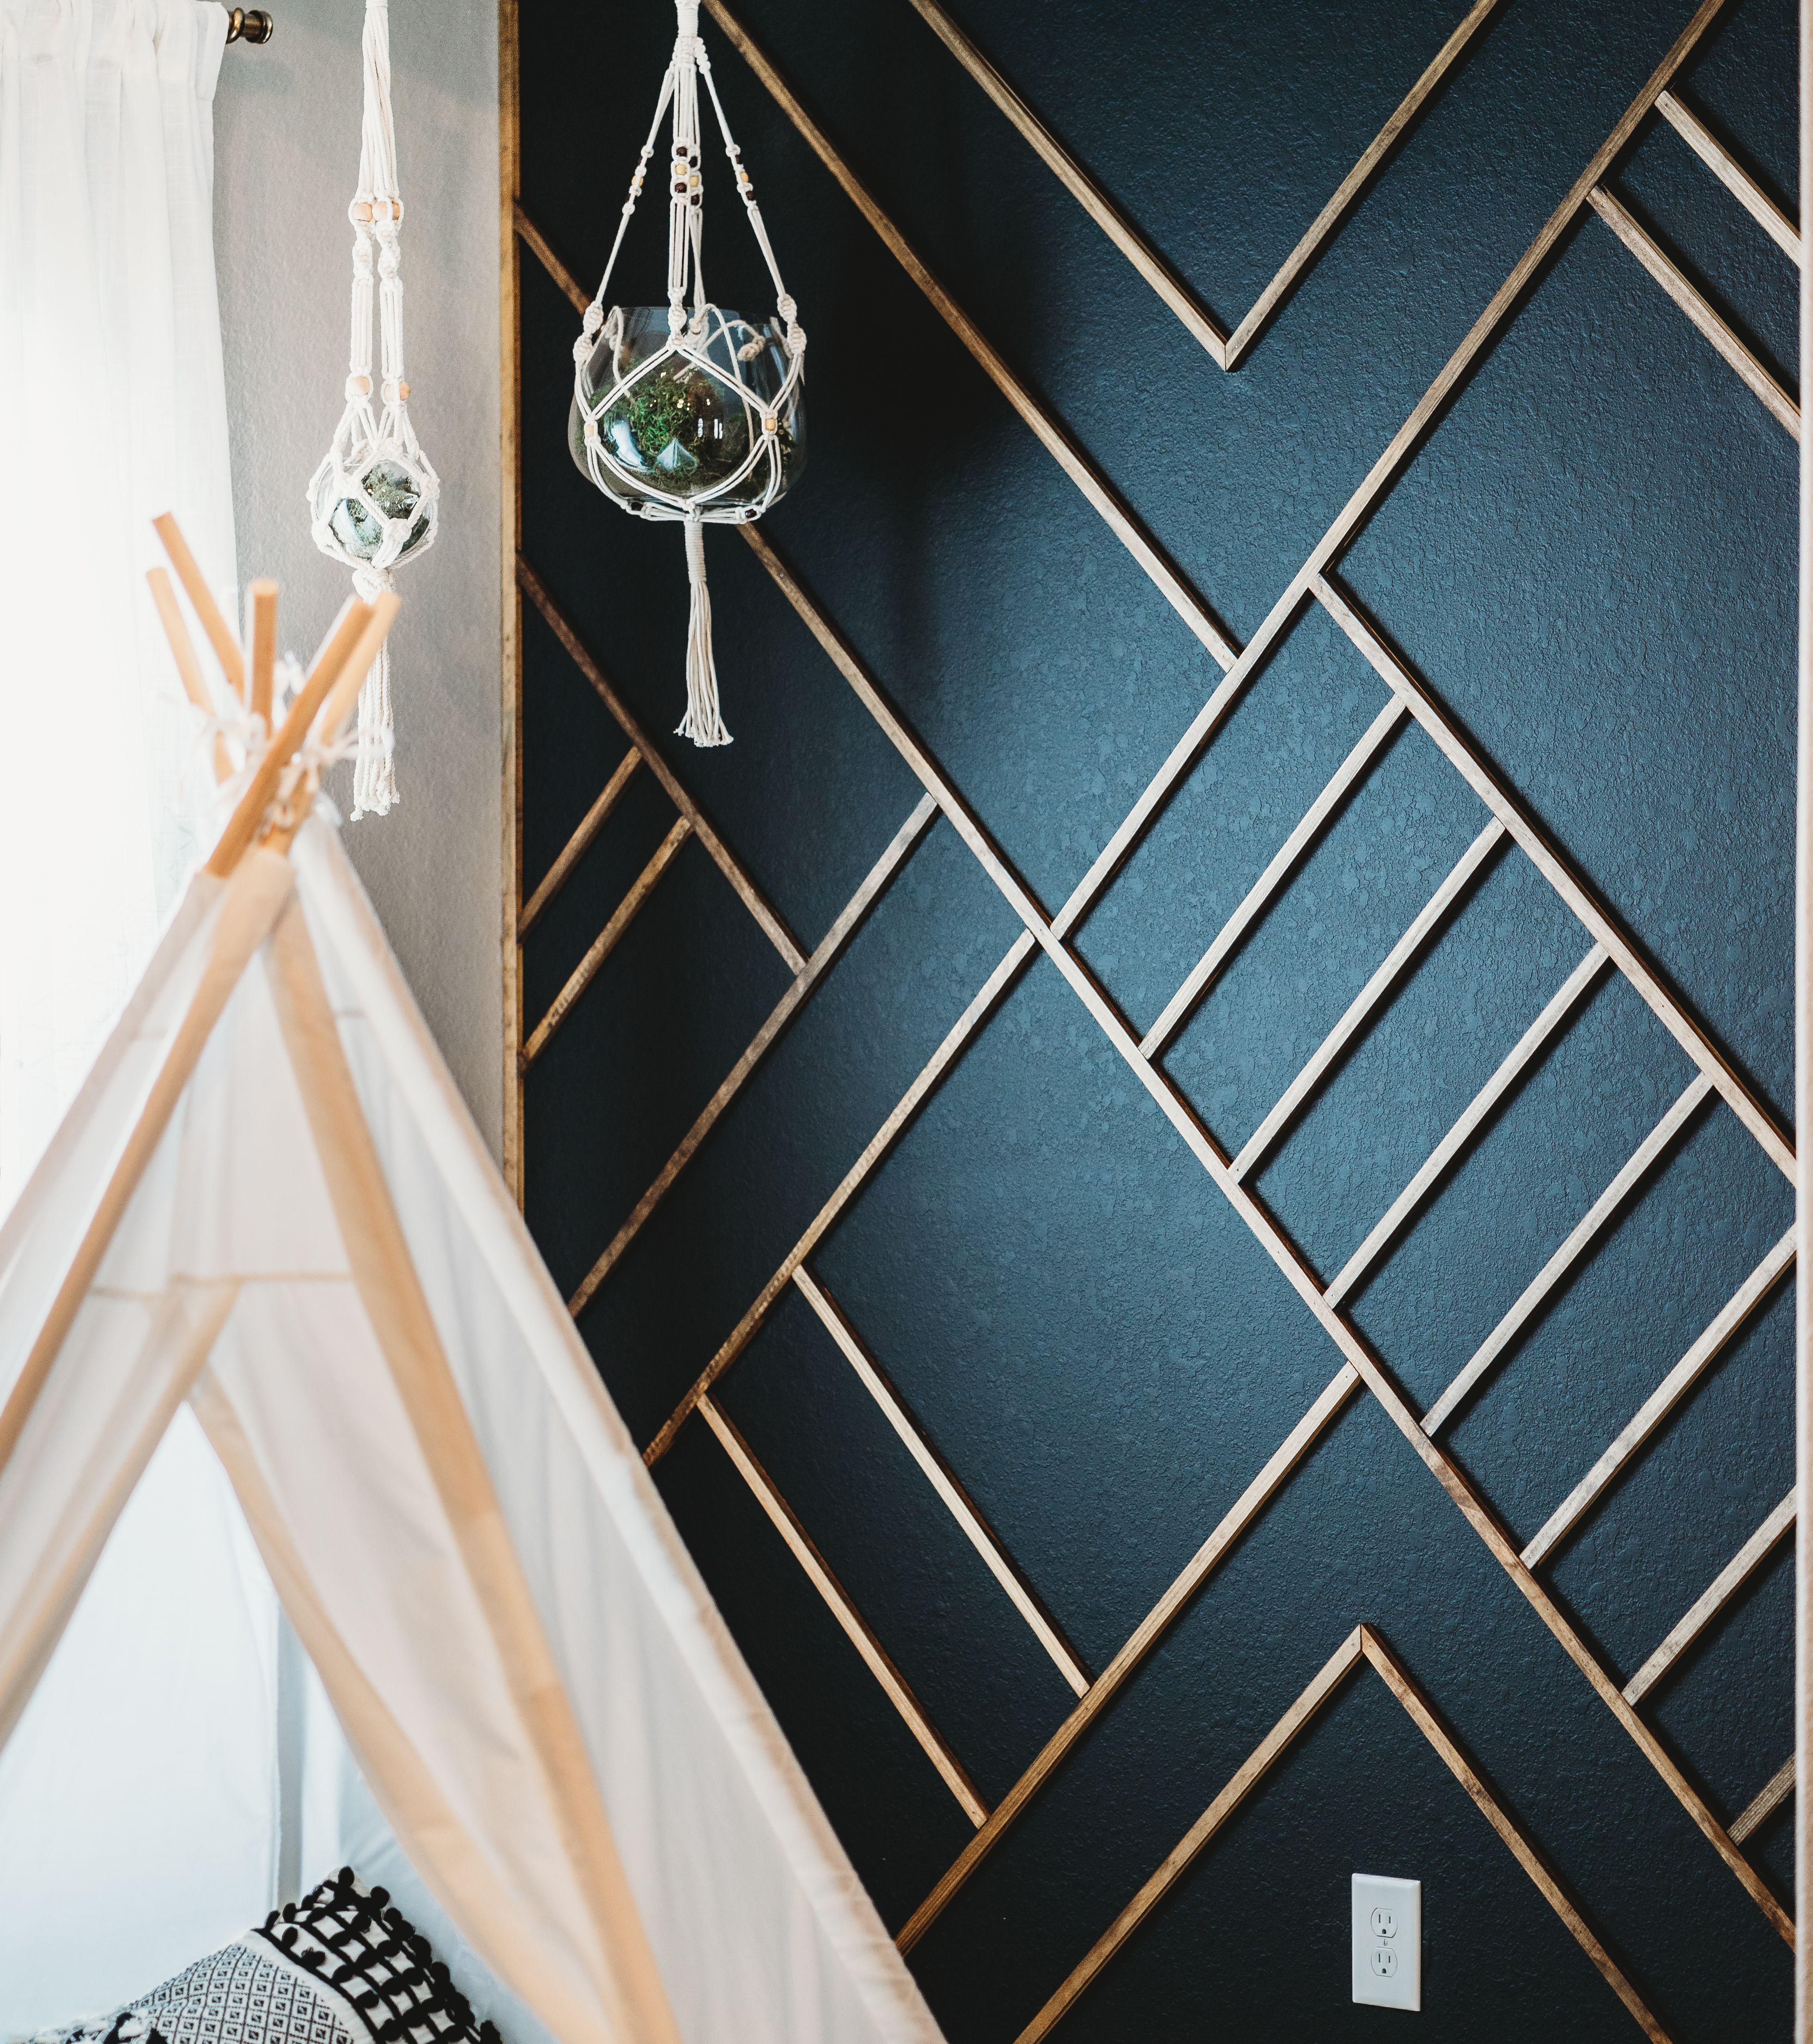 Diy Wall Decor For Playroom Kids Room Etc Wall Decor Design Wooden Accent Wall Wood Accent Wall